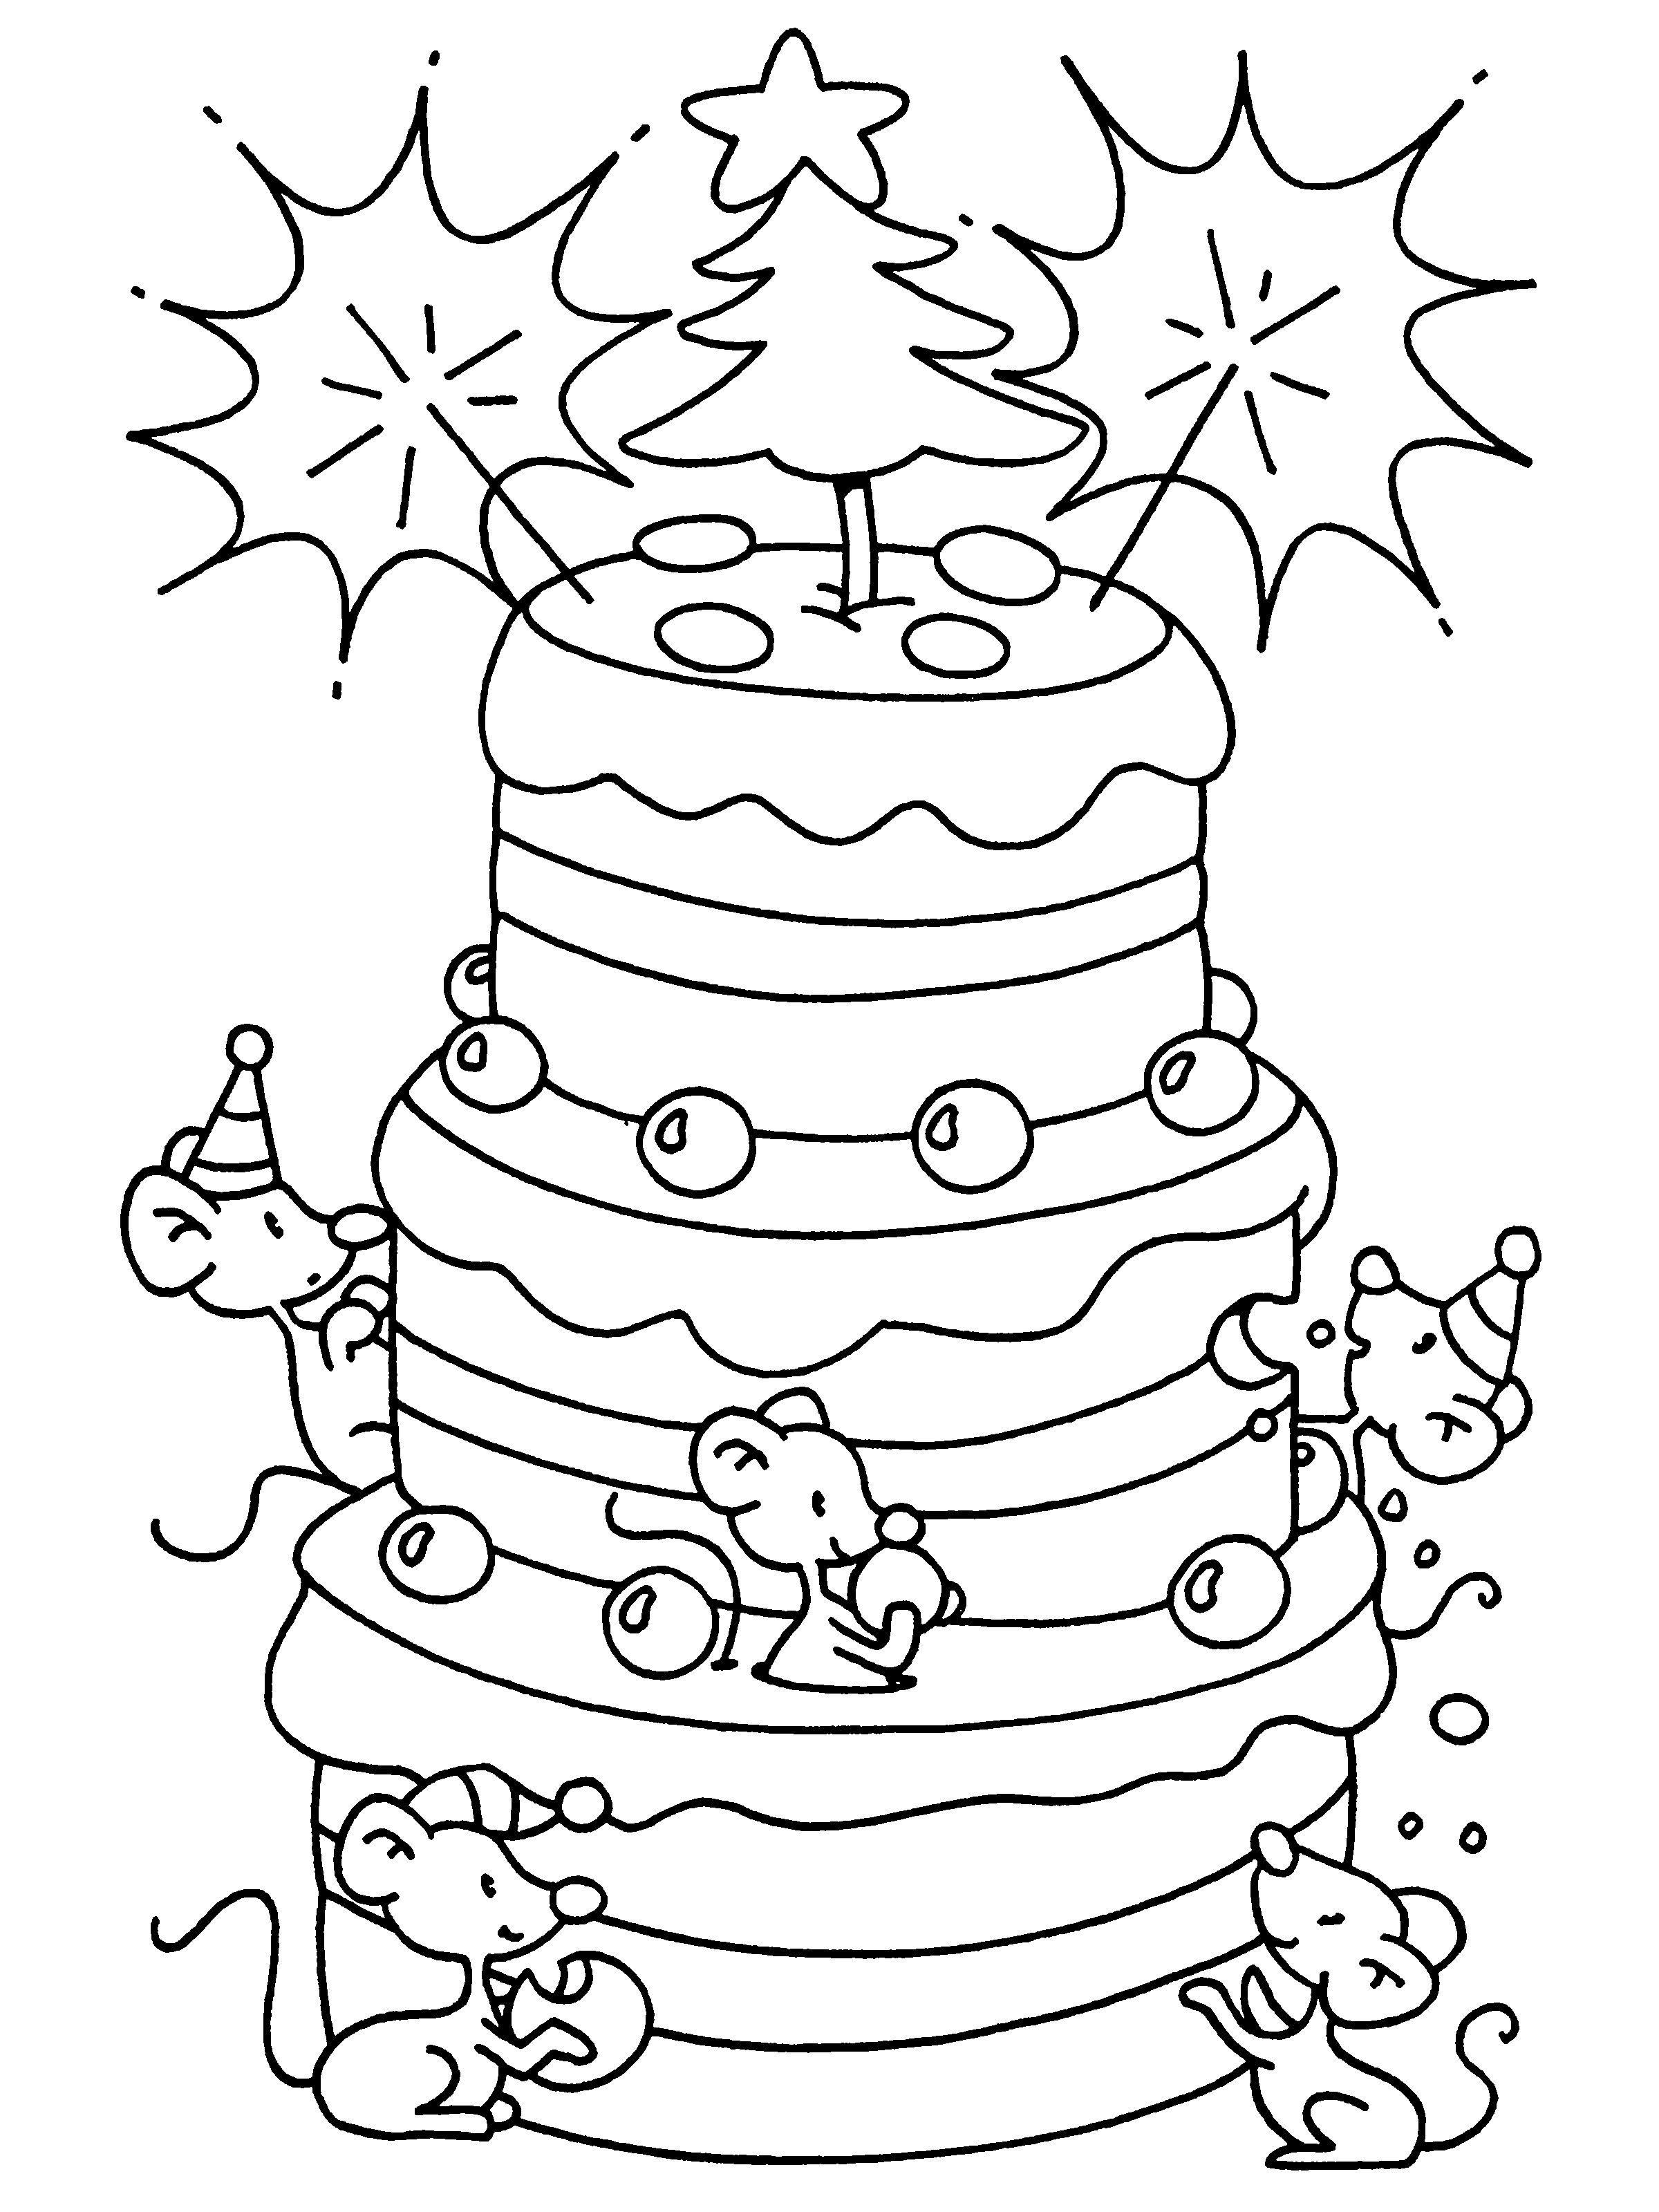 Kleurplaat Verjaardag Papa Mama Verjaardag Cheque Minion Verjaardag Verjaardag Vader Verjaardag Uitnodigingen